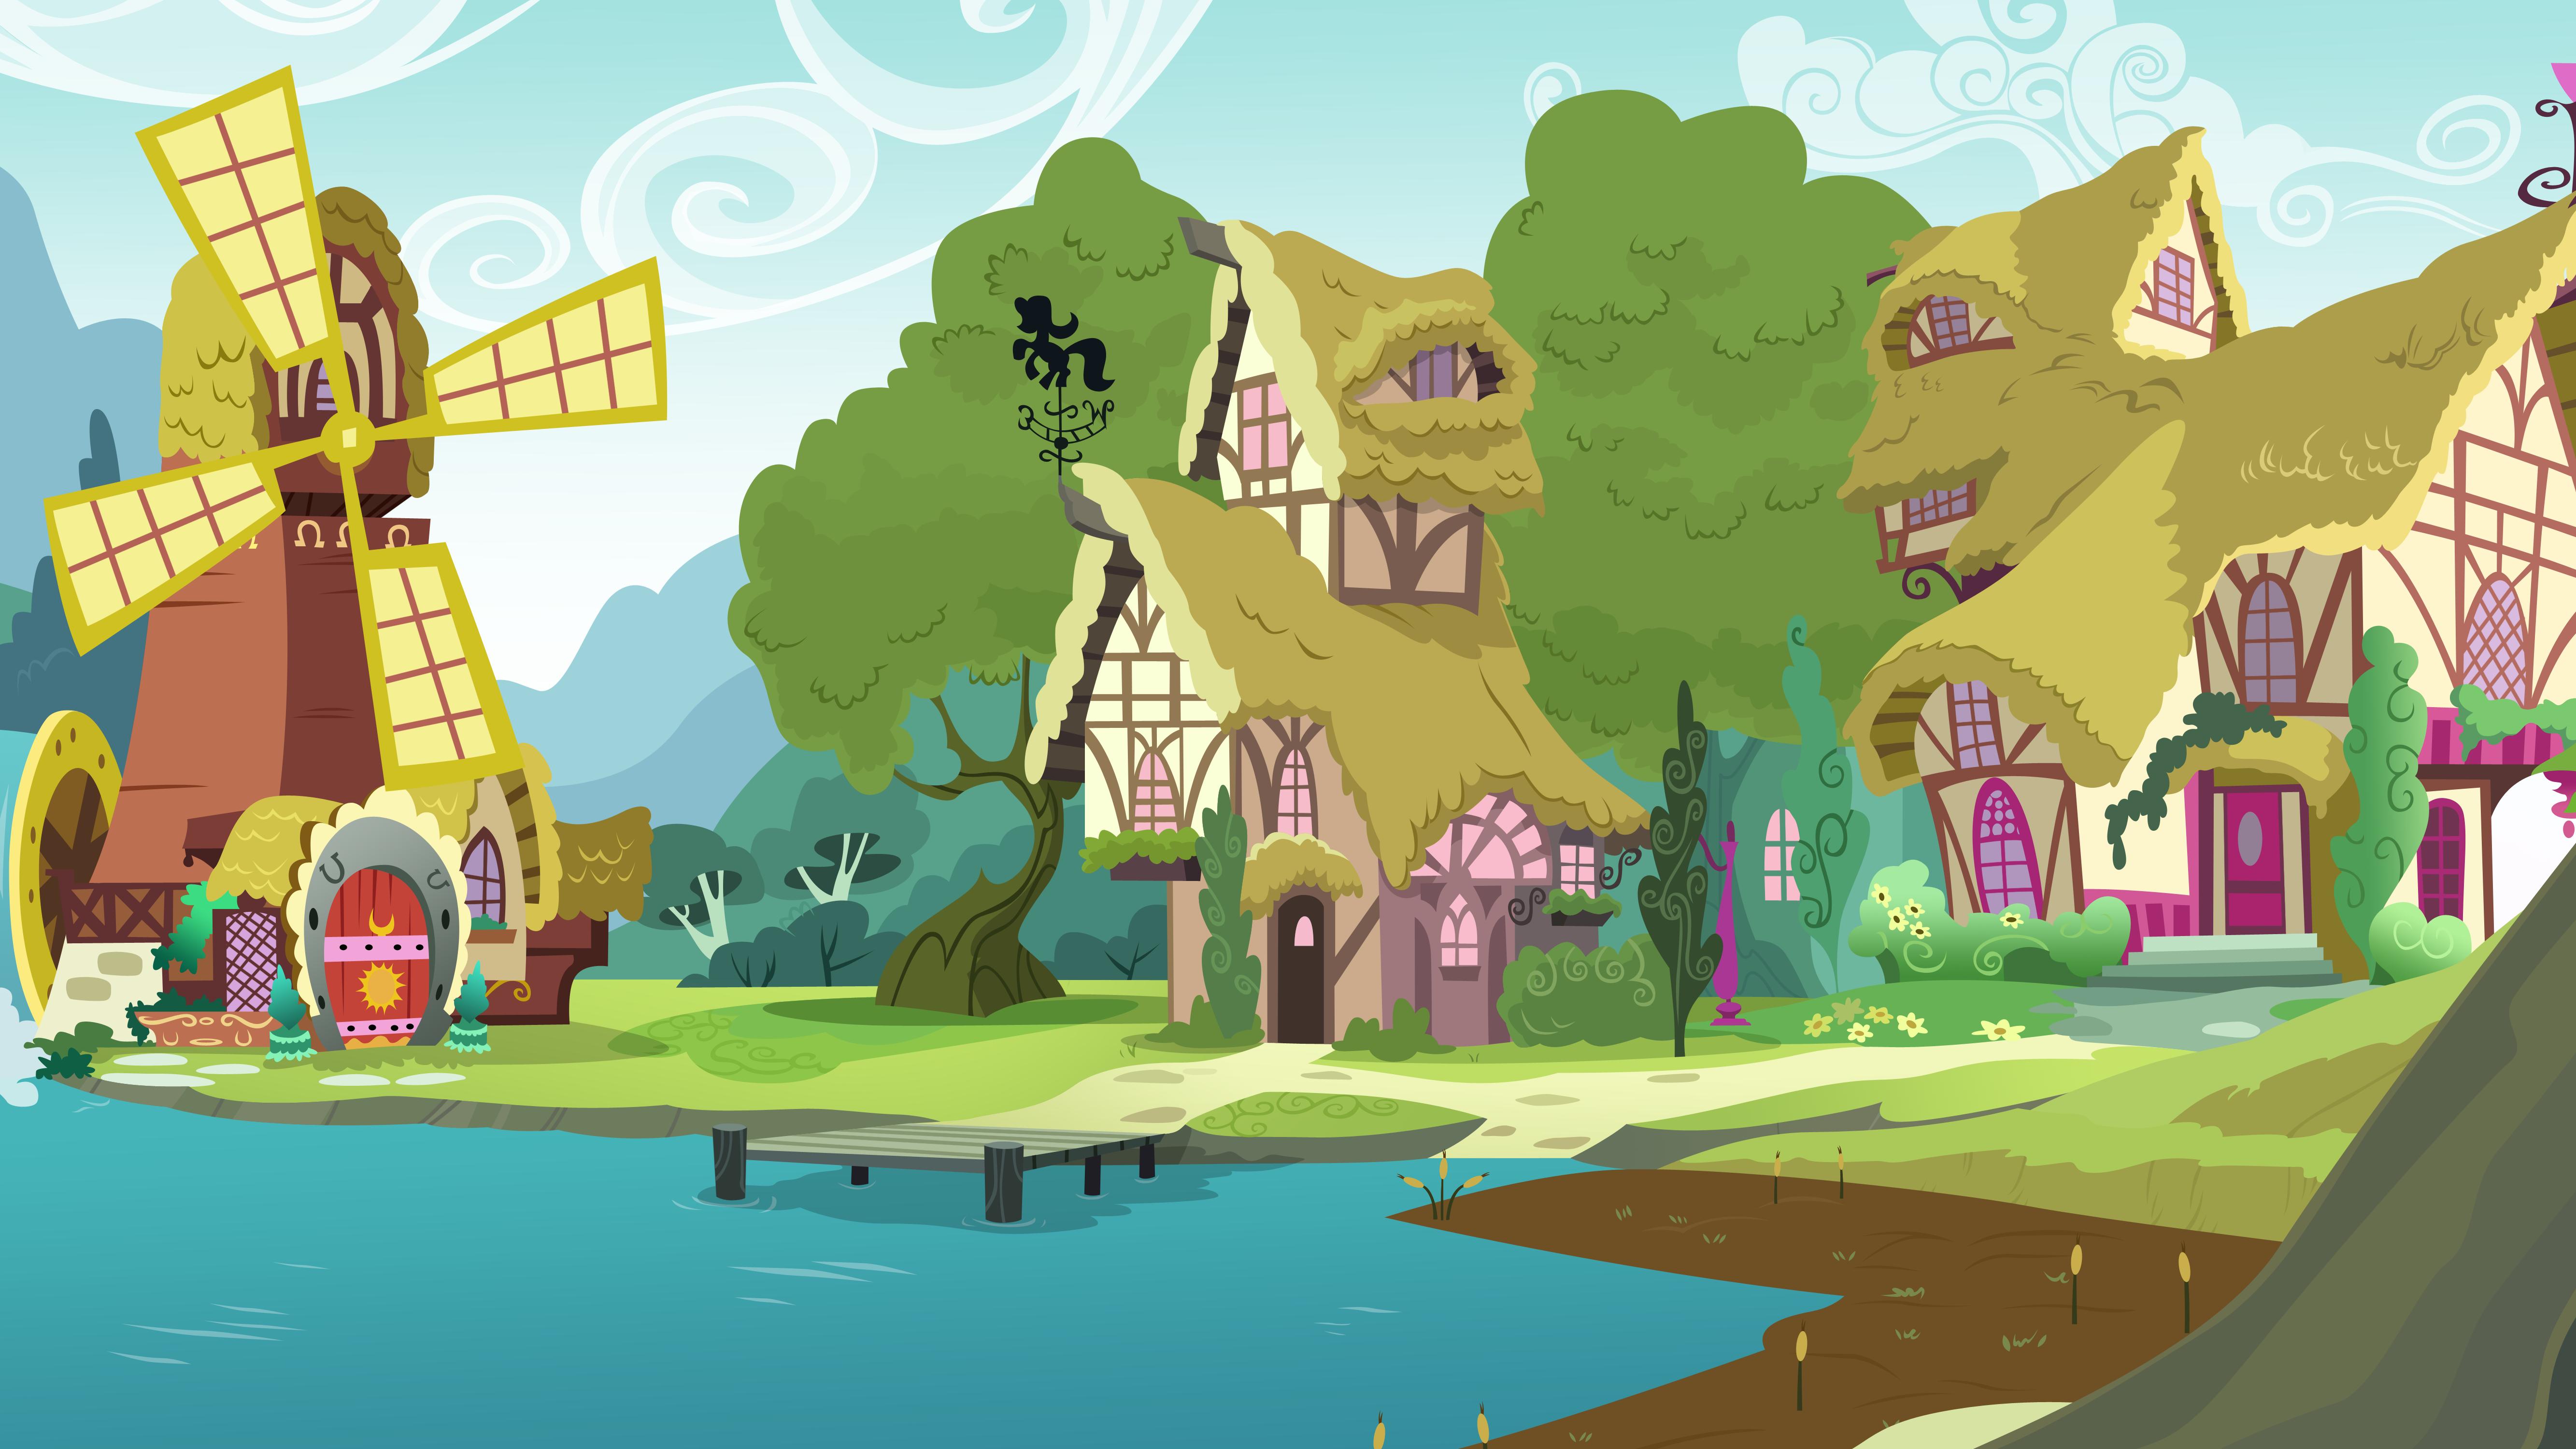 Ponyville Riverside by Kooner-cz